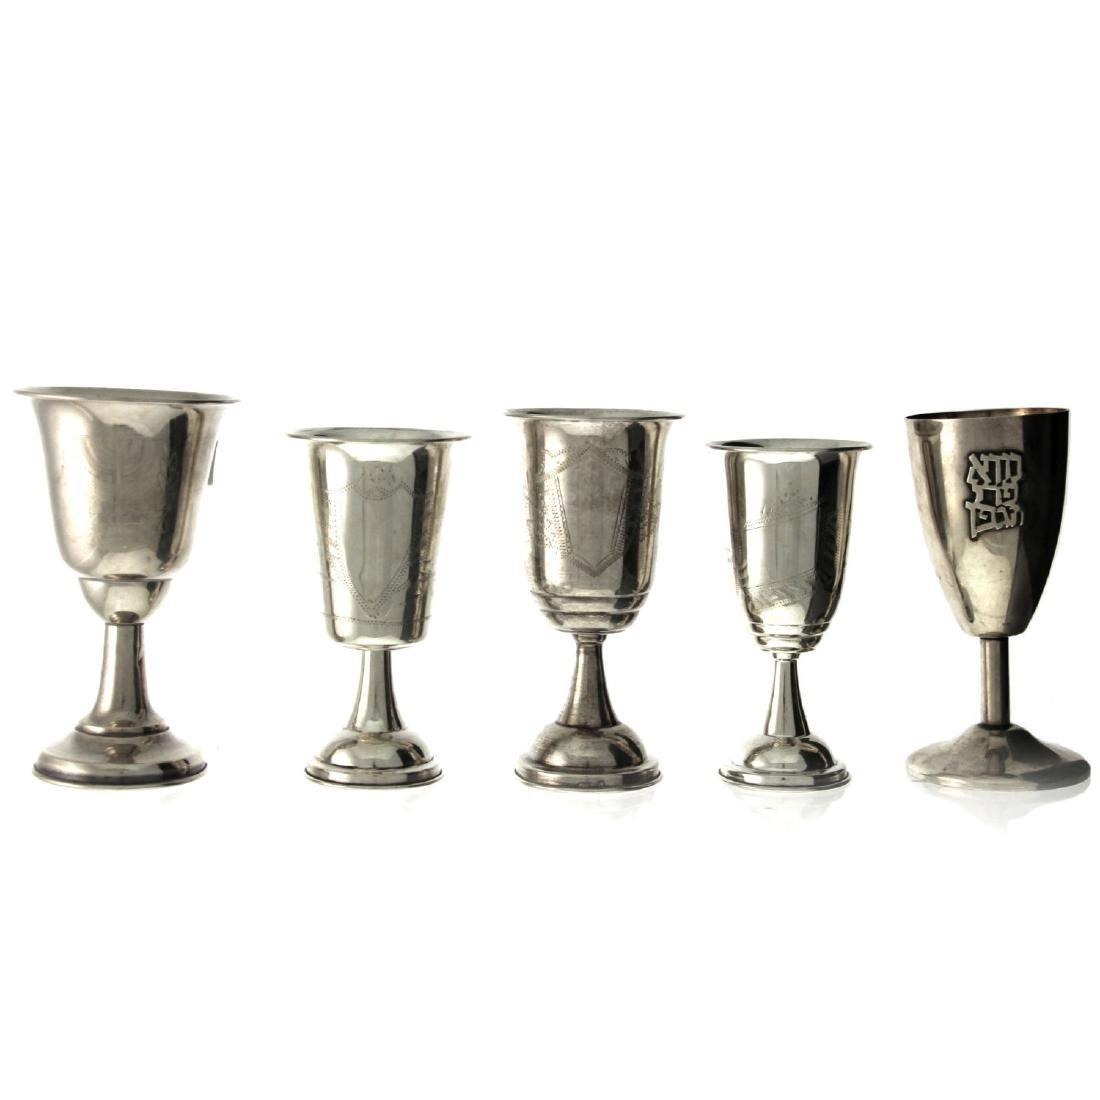 Lot of Five Silver Kiddush Cups.